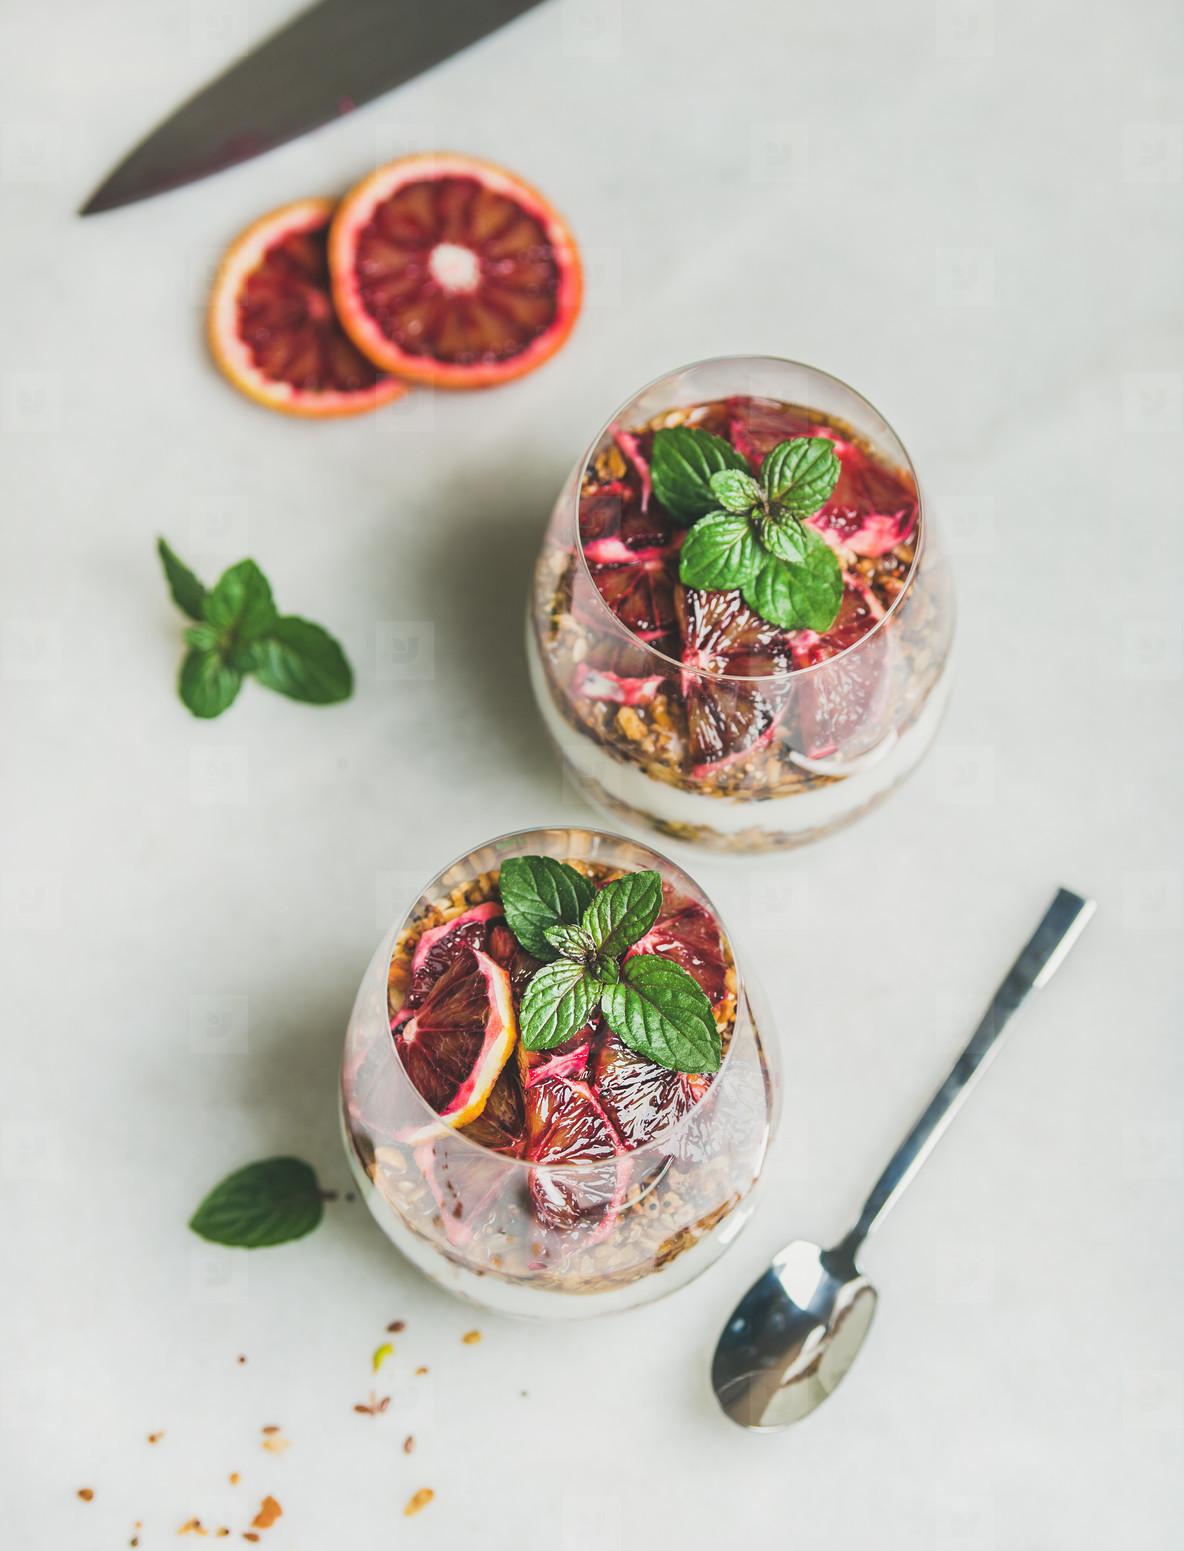 Healthy breakfast with greek yogurt  granola  orange layered parfait